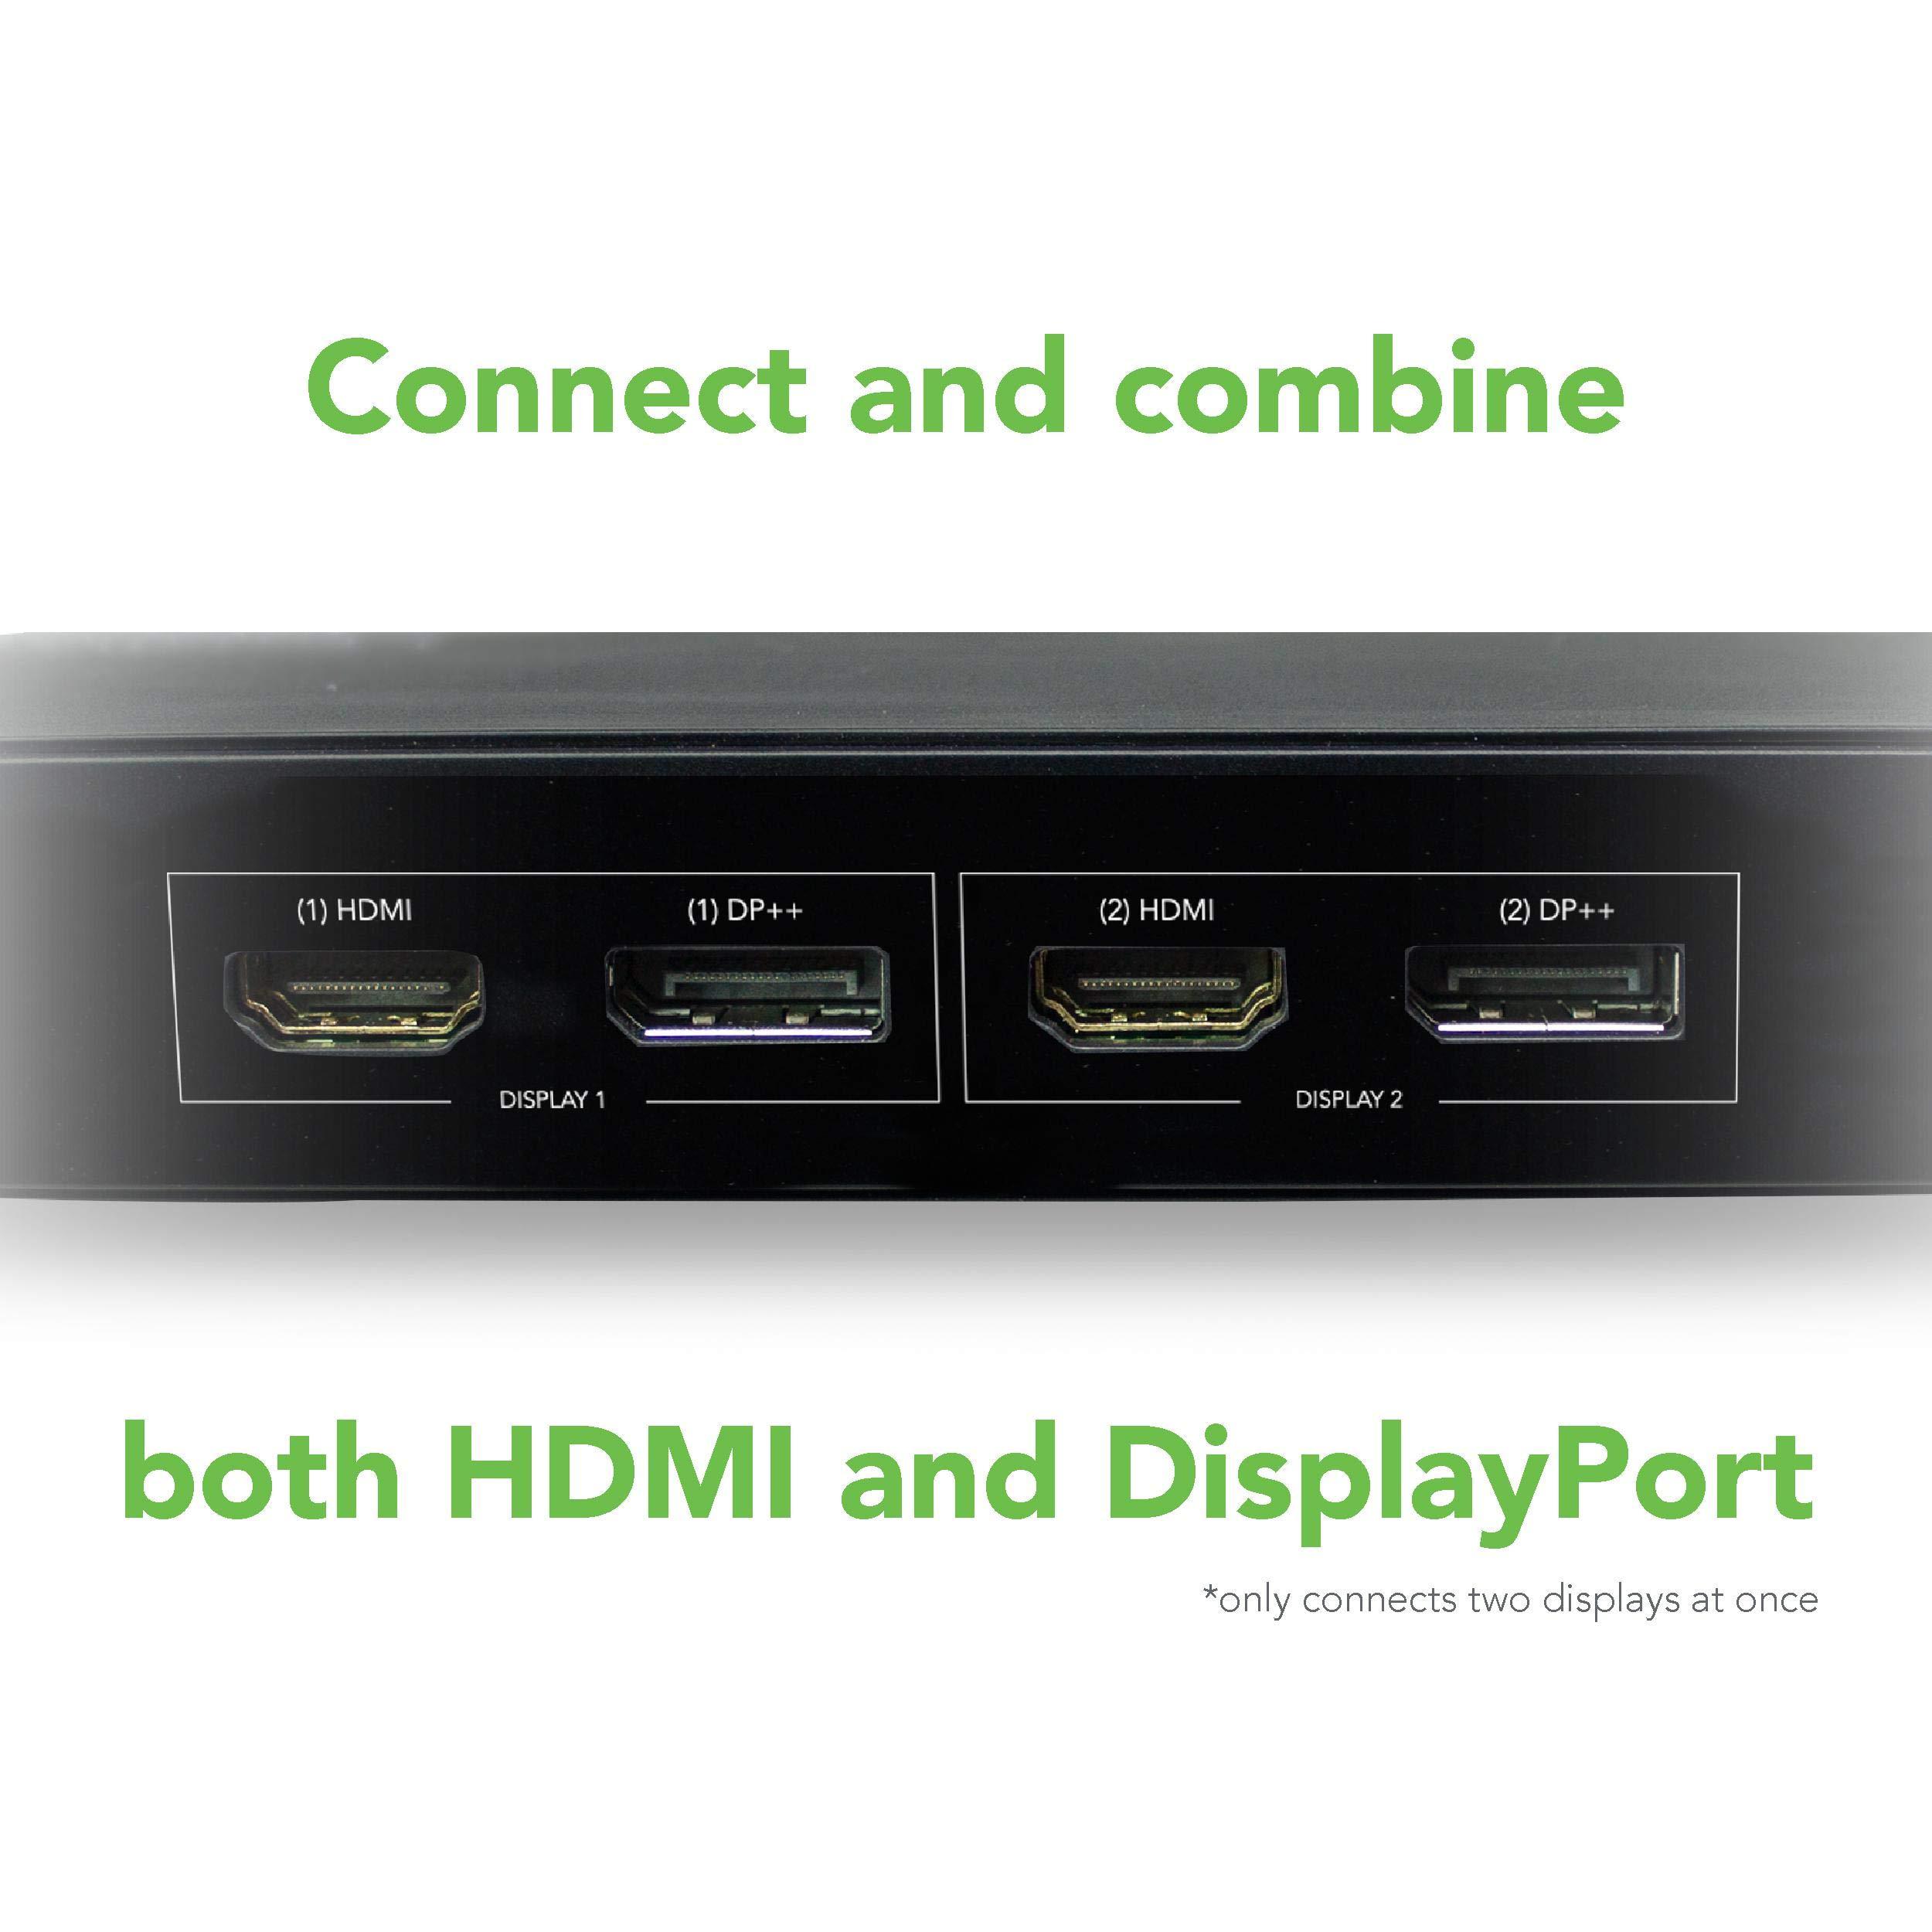 Plugable USB 3.0 Dual 4K Display Horizontal Docking Station with DisplayPort and HDMI for Windows (Dual 4K DisplayPort & HDMI, Gigabit Ethernet, Audio, 6 USB Ports) by Plugable (Image #3)